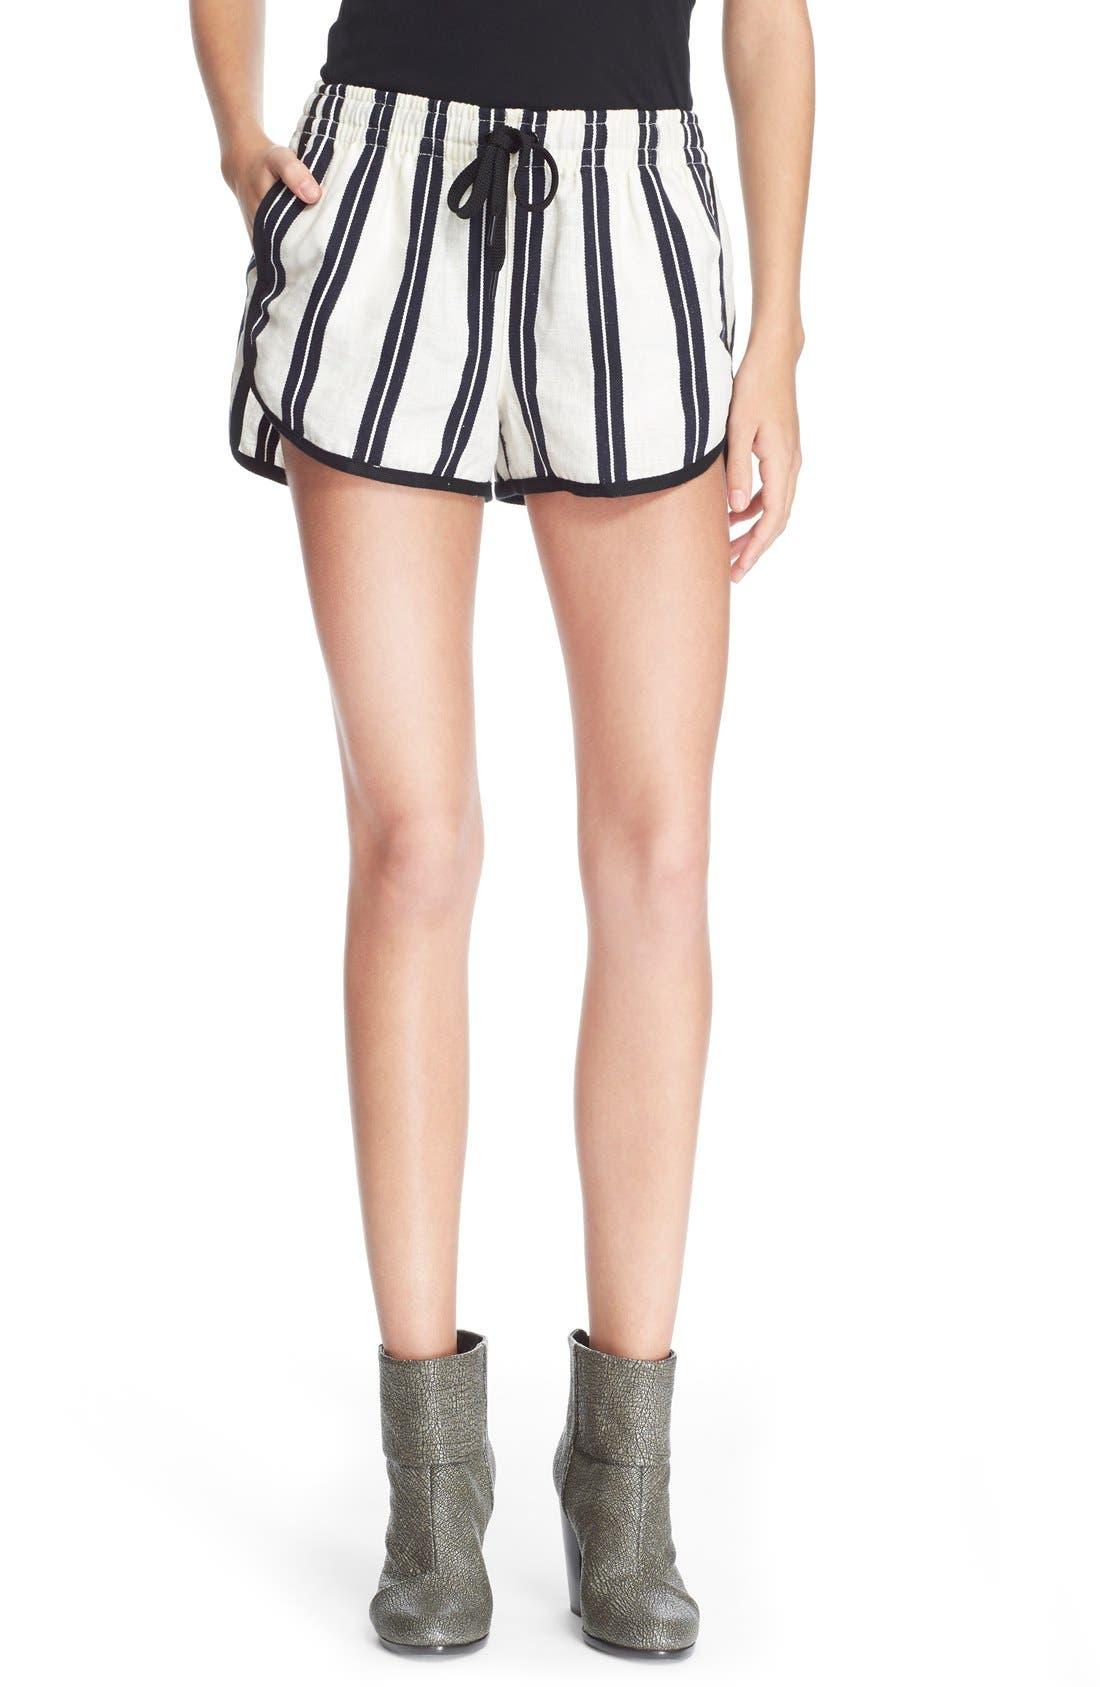 Main Image - rag & bone/JEAN 'Beach' High Rise Stripe Shorts